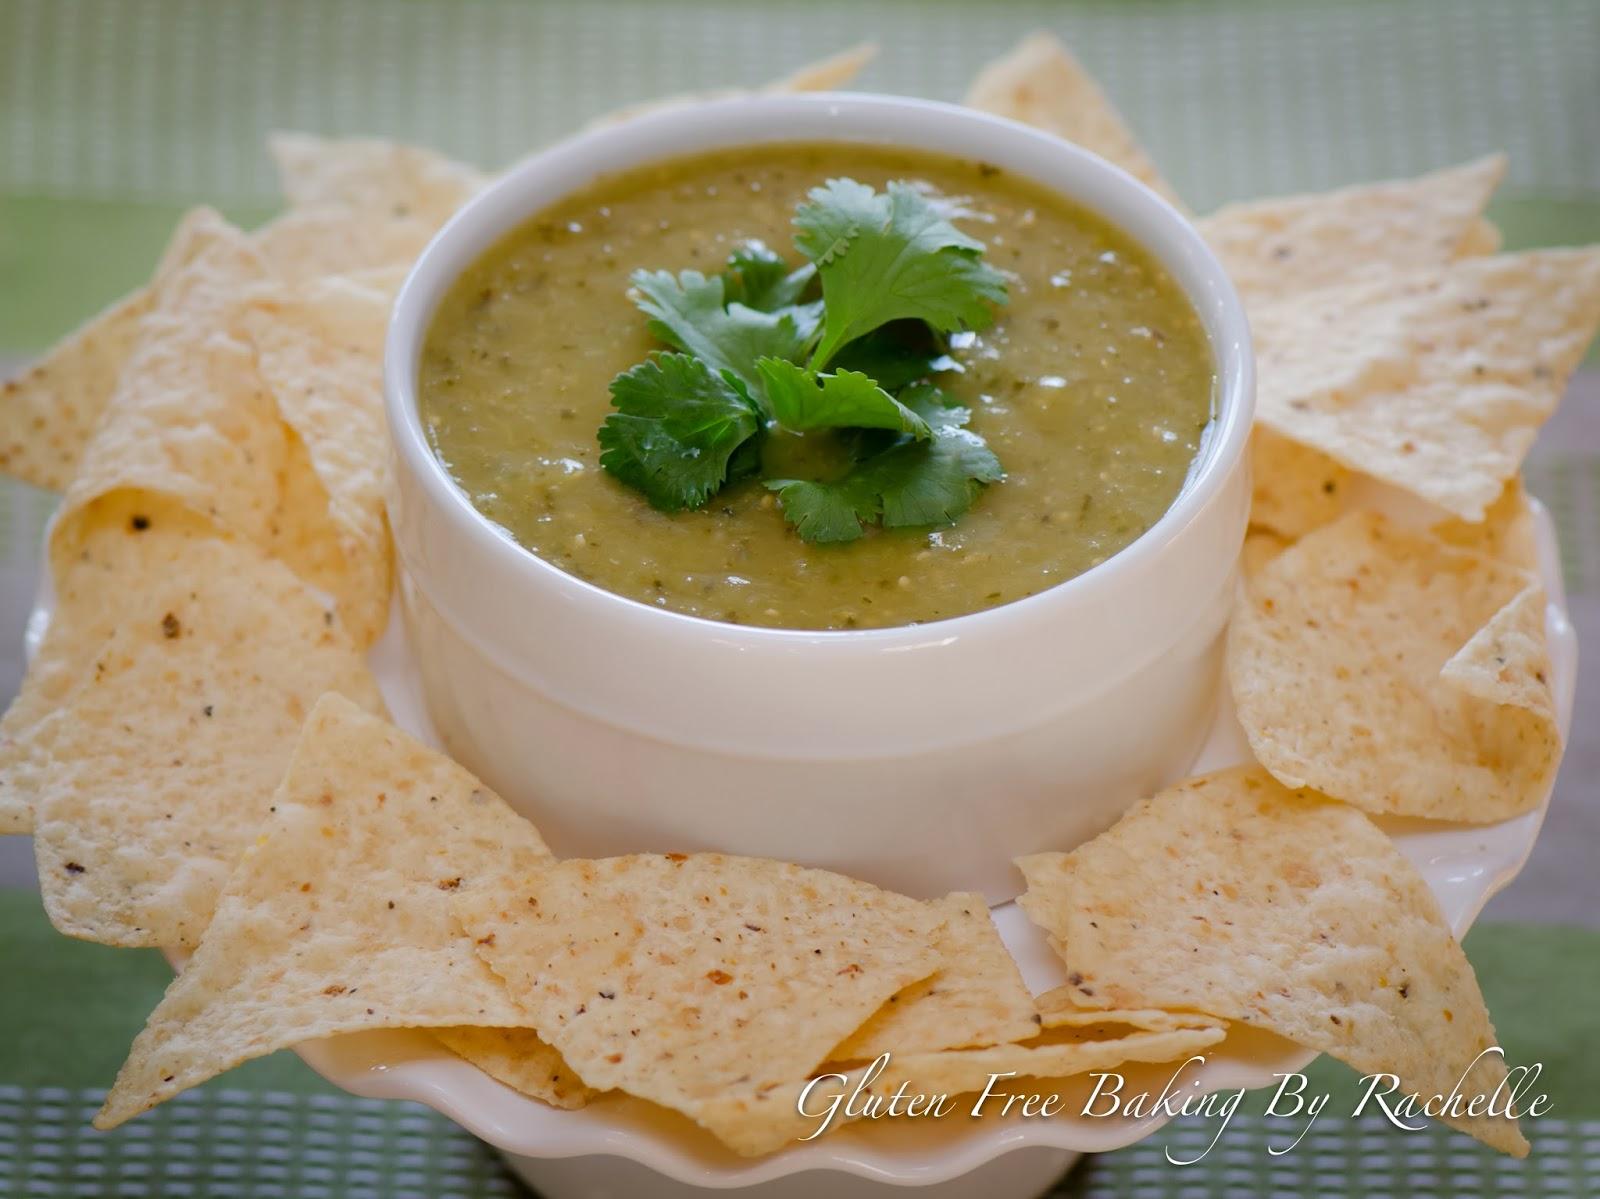 Gluten Free Baking By Rachelle: Roasted Salsa Verde